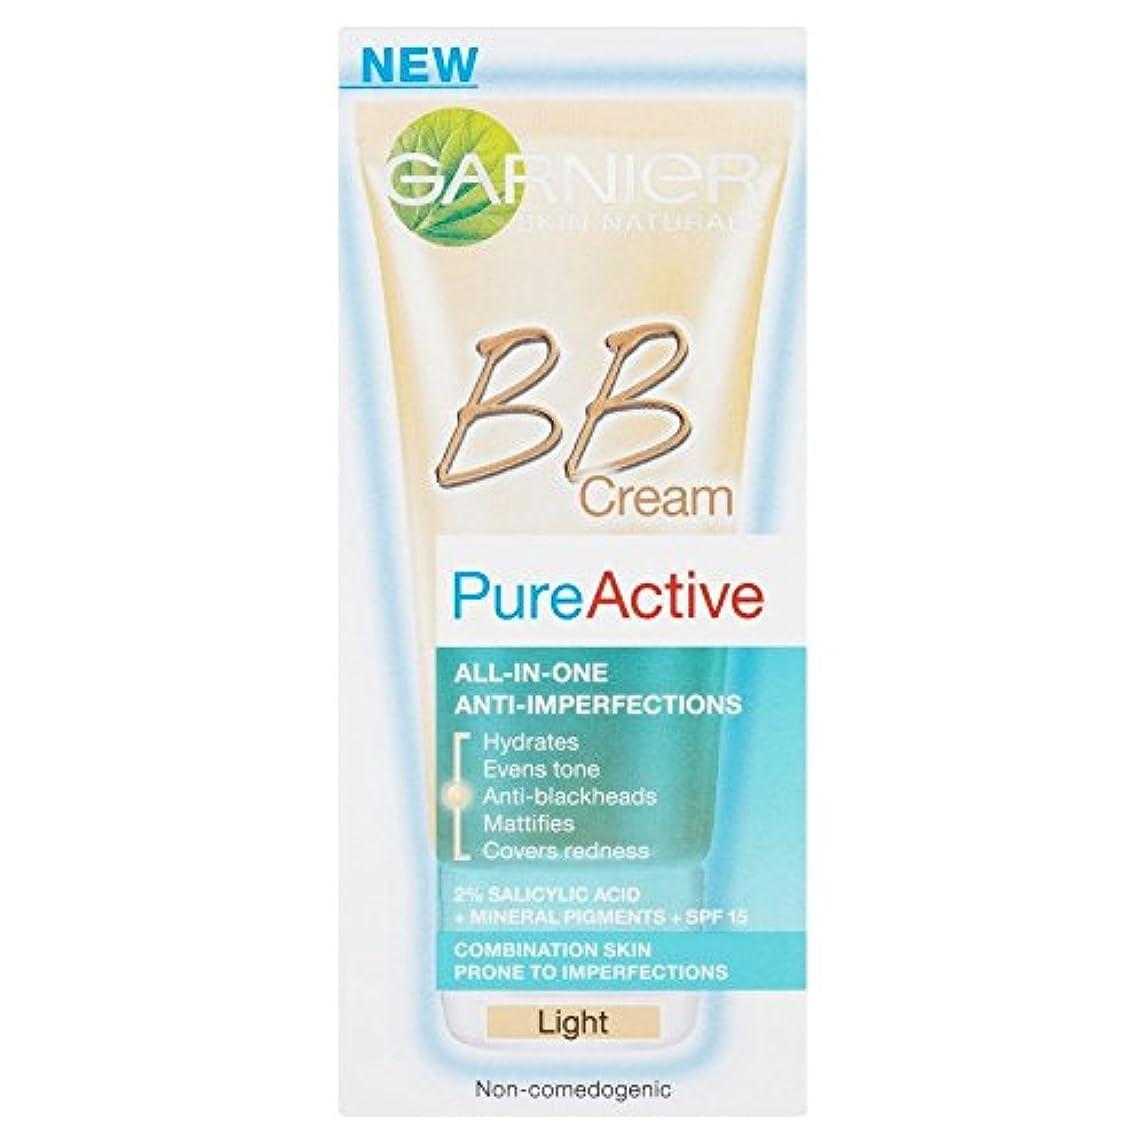 Garnier Pure Active BB Cream - Light (50ml) ガルニエ純粋な活性bbクリーム - 光( 50ミリリットル) [並行輸入品]